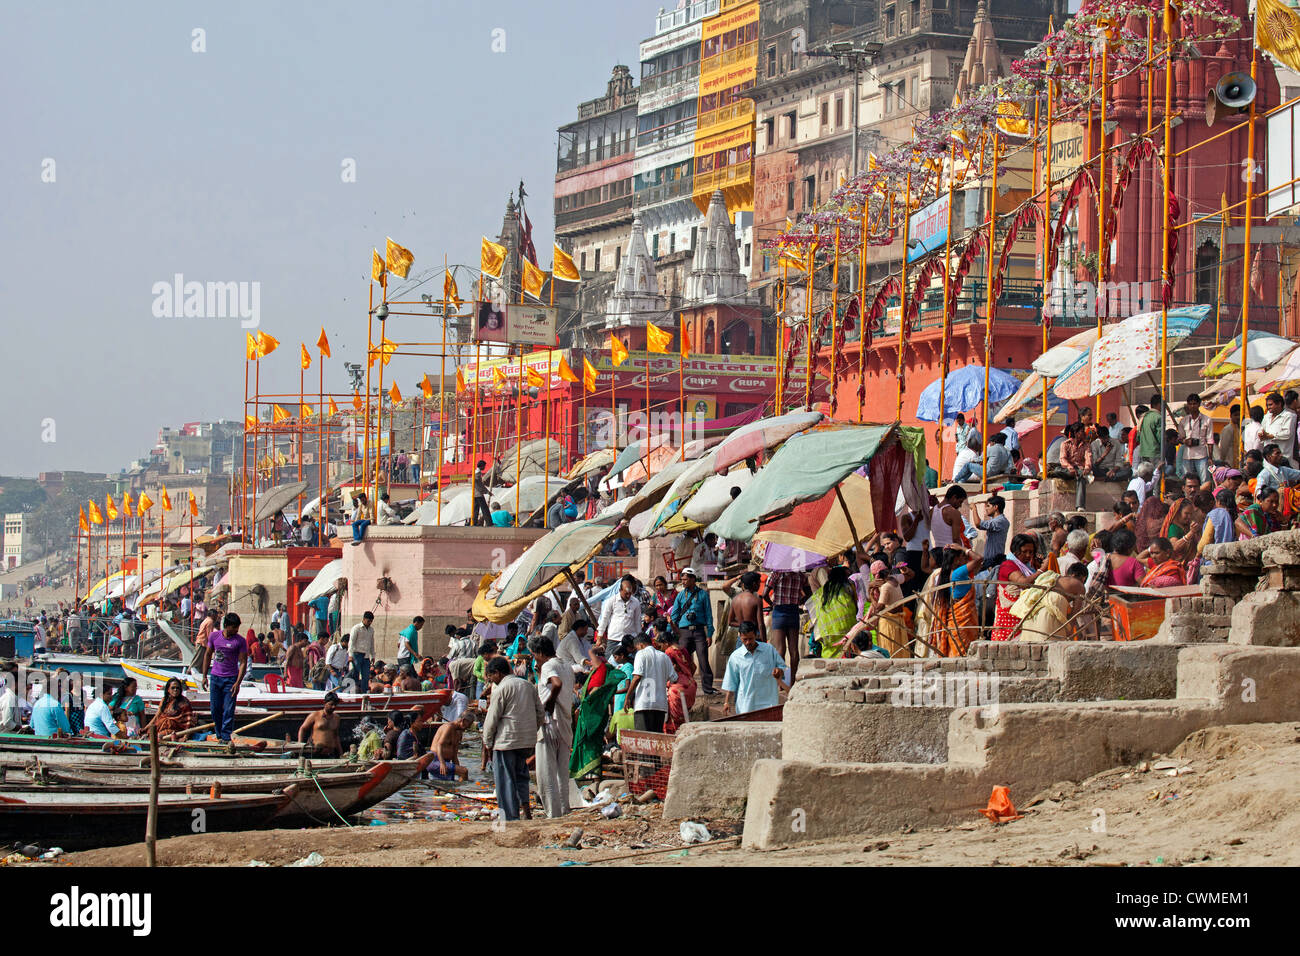 Hindu pilgrims gathering at a ghat to bathe in the Ganges river in Varanasi, Uttar Pradesh, India - Stock Image